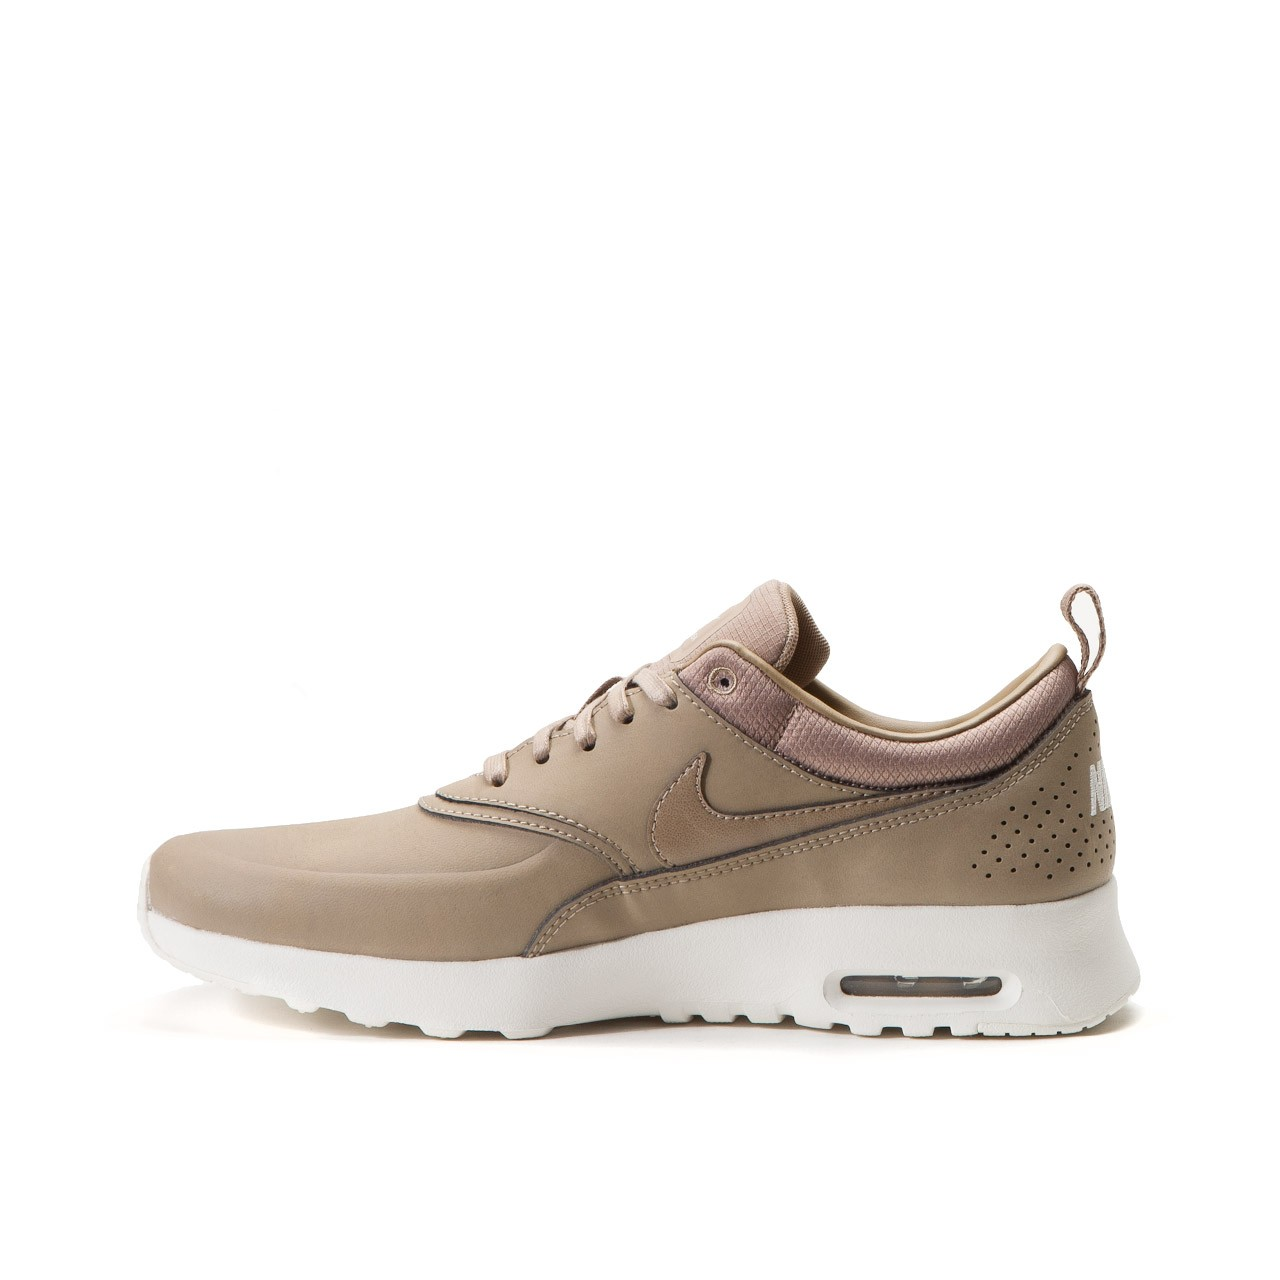 best service e0230 699ce Nike Wmns Air Max Thea PRM (Desert Camo)